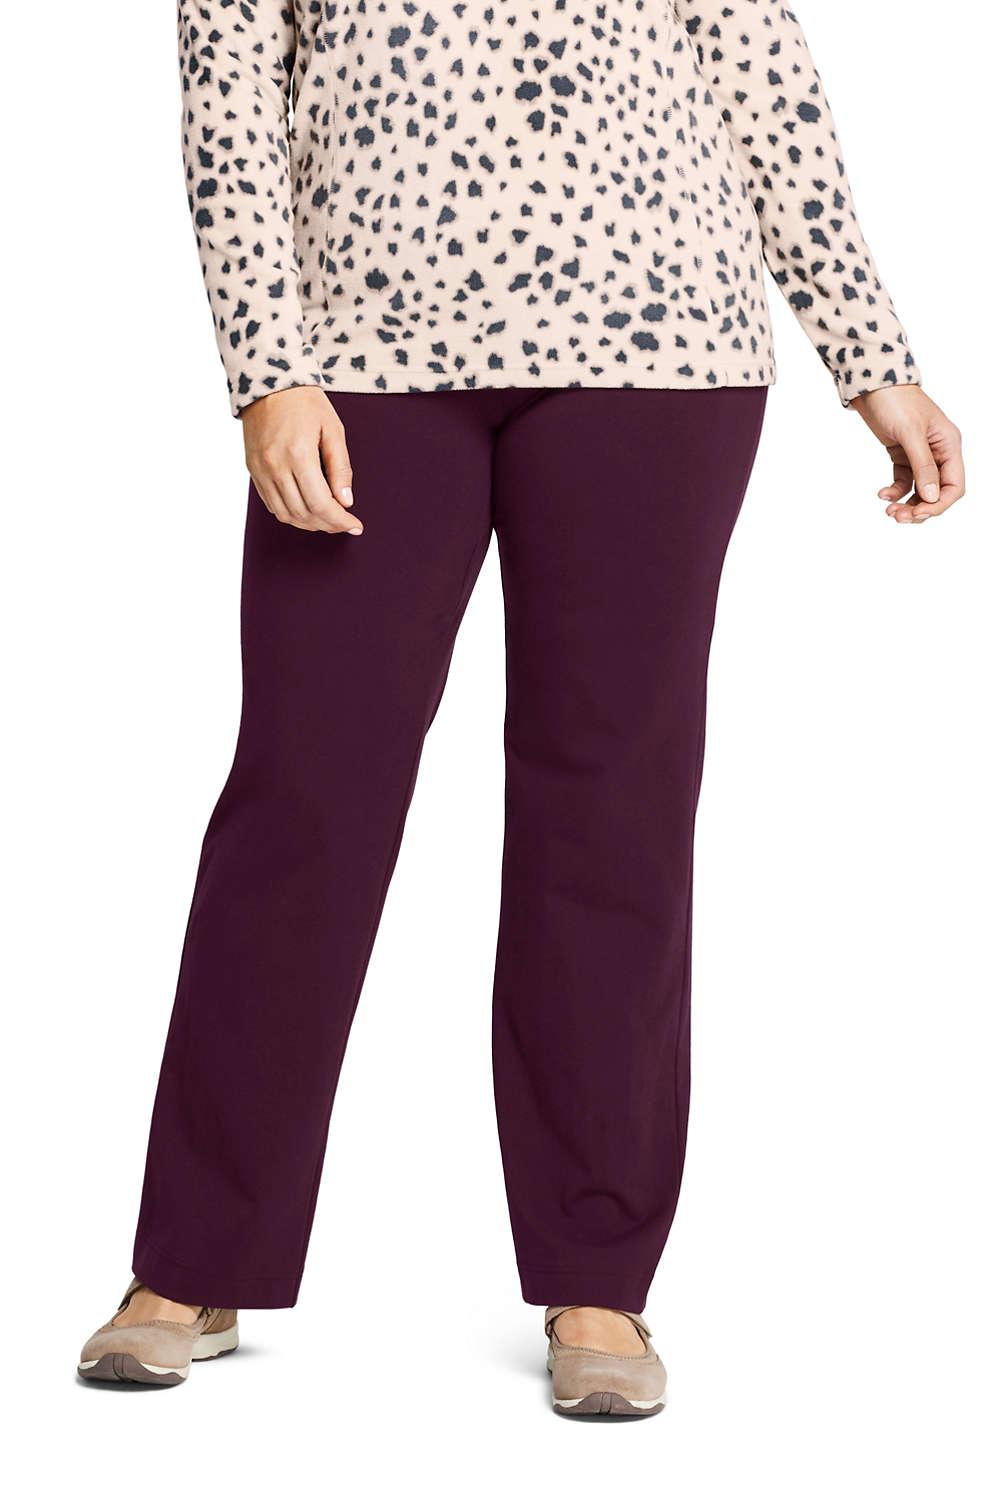 Women\'s Plus Size Starfish Mid Rise Straight Leg Elastic Waist Pull On Pants